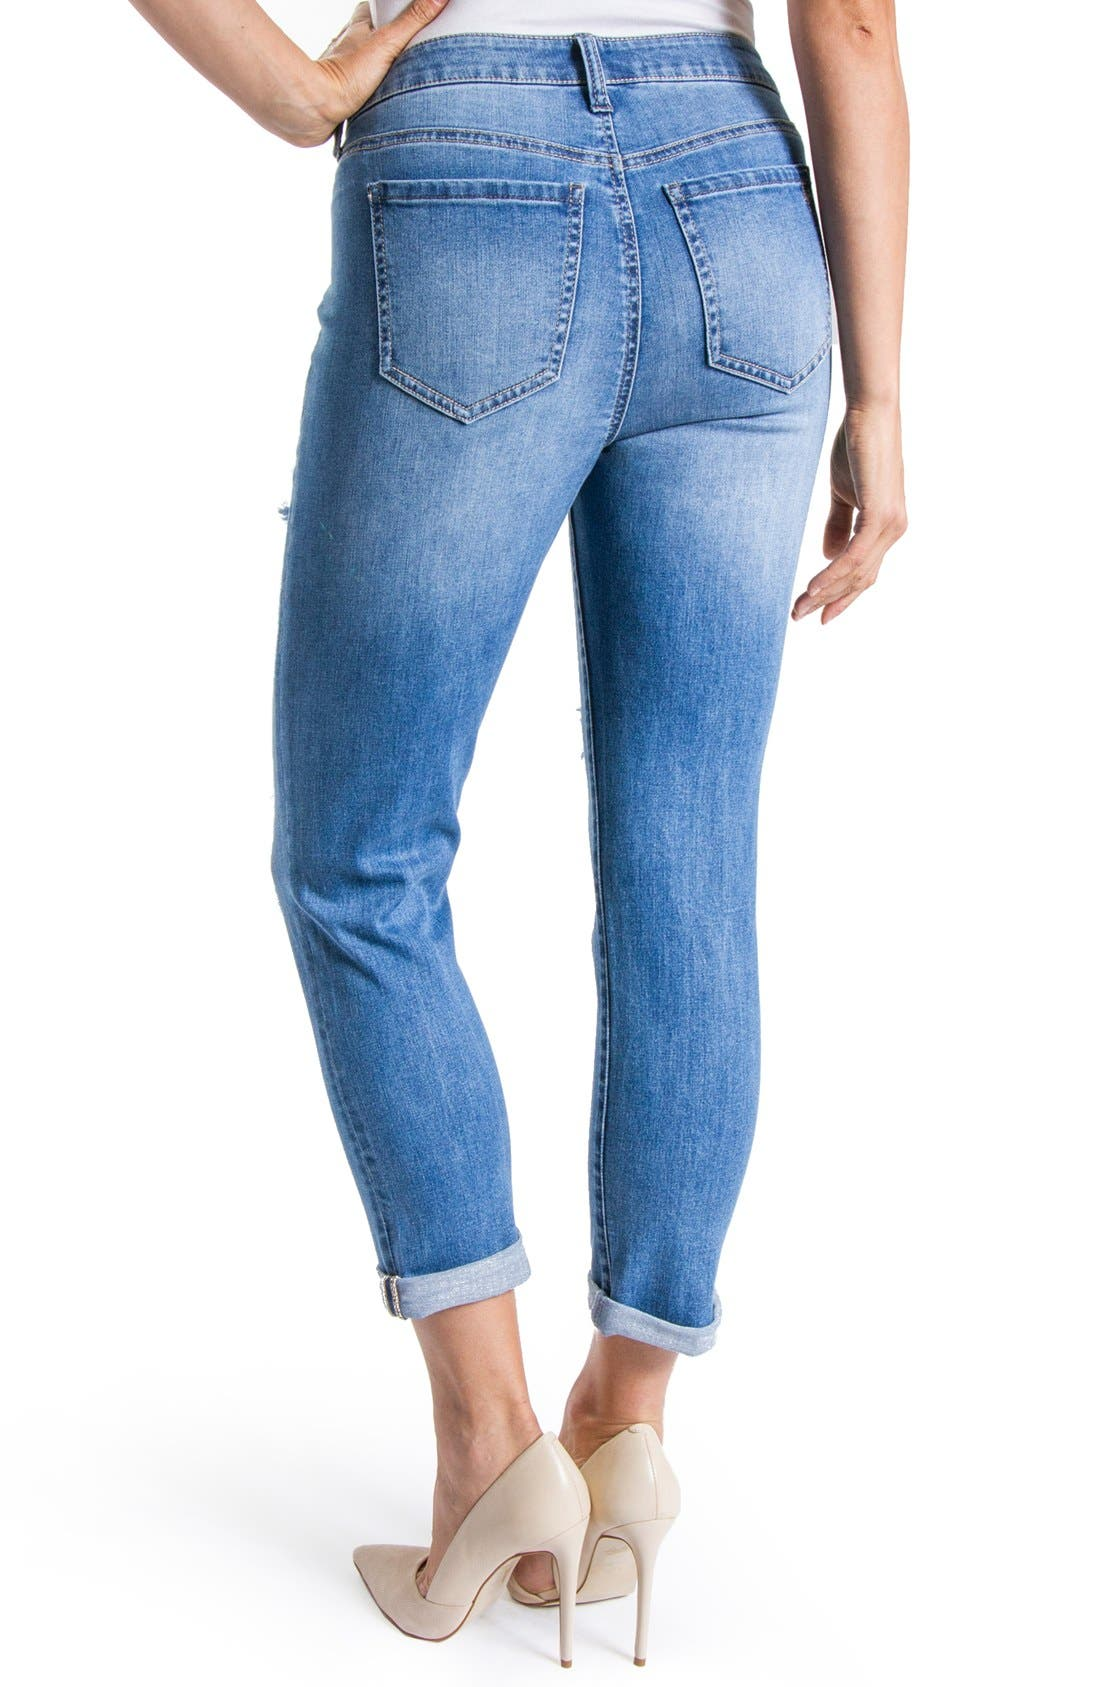 Alternate Image 3  - Liverpool Jeans Company 'Corey' Distressed Crop Boyfriend Jeans (Melbourne)